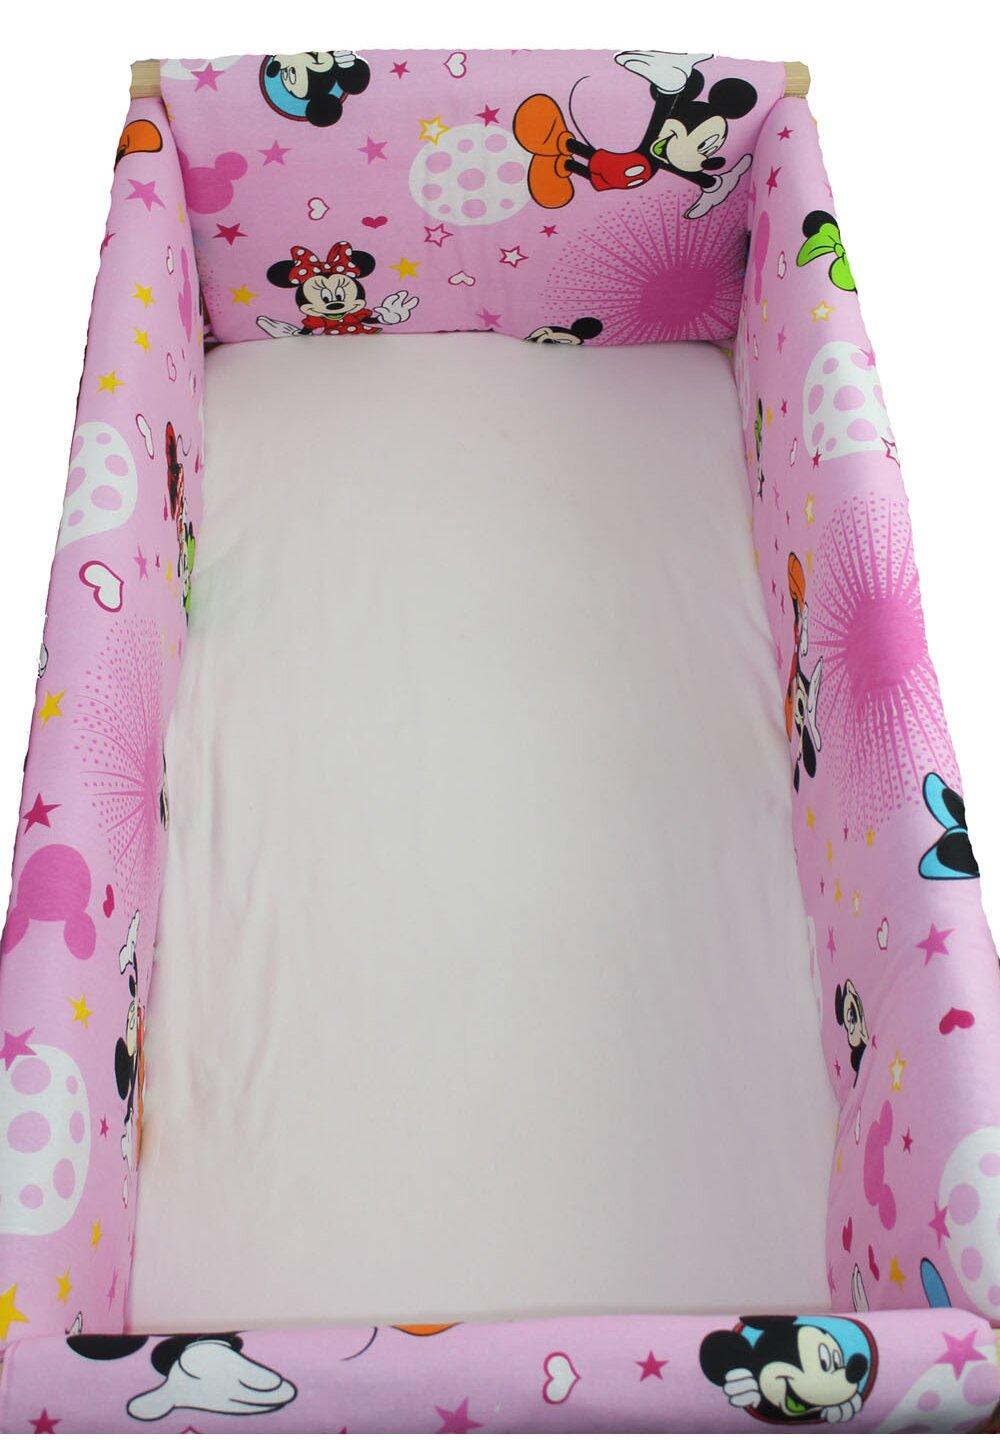 Set aparatoare patut, Maxi,Minnie si Mickey, roz cu stelute, 120x 60 cm imagine